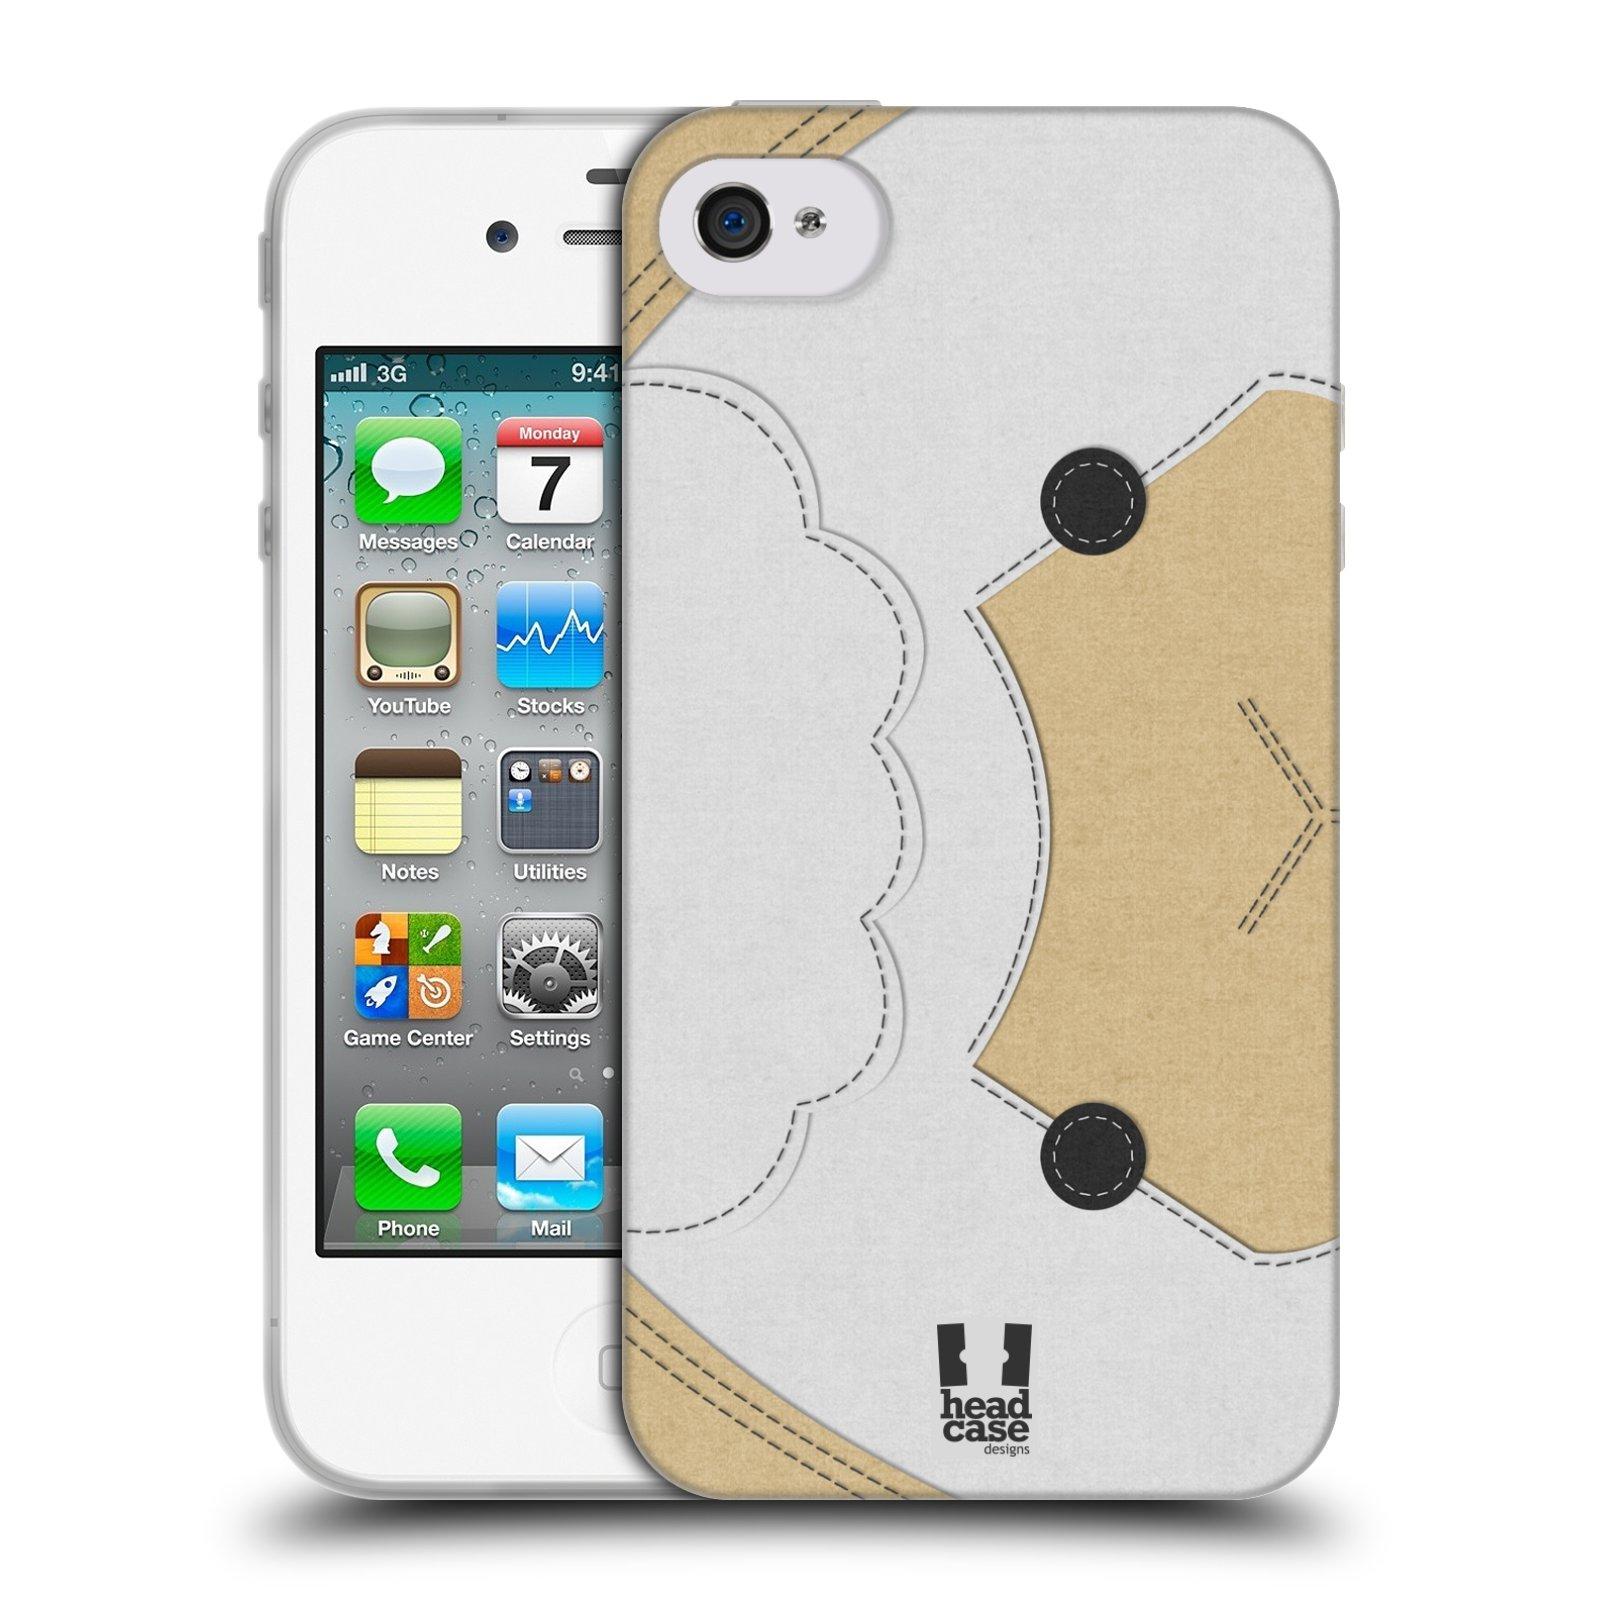 HEAD CASE silikonový obal na mobil Apple Iphone 4/4S vzor zvířecí nášivka ovečka